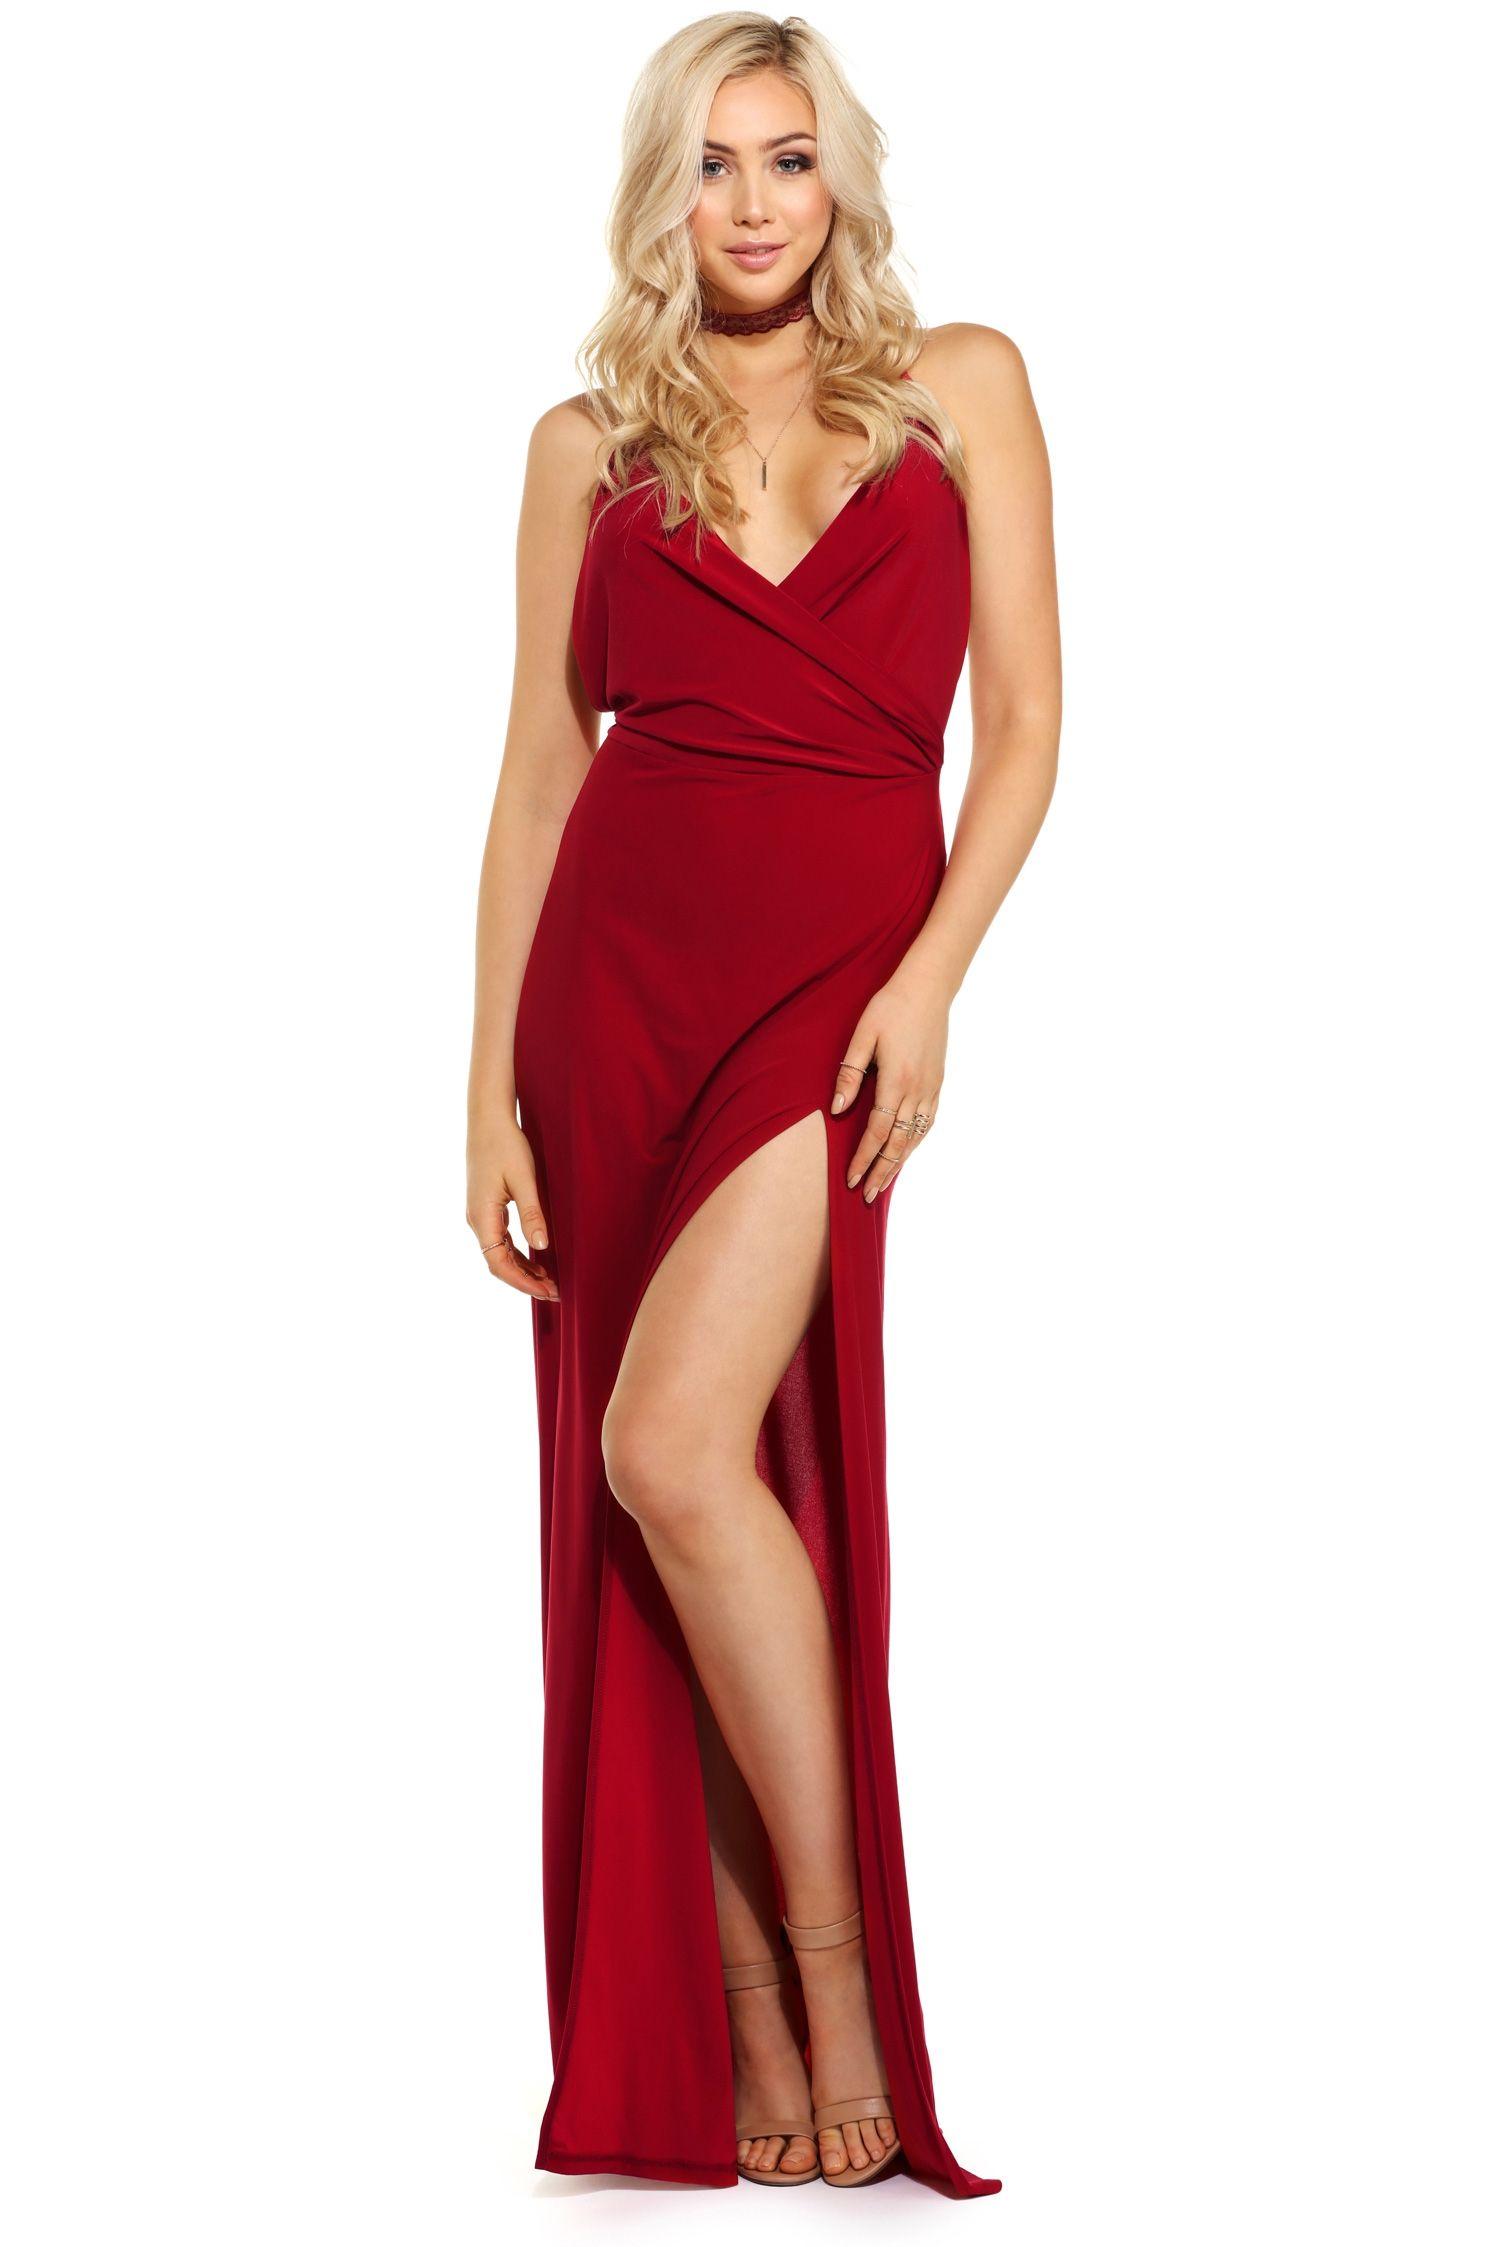 ed54b090a4 Dahlia Red Slit Formal Dress